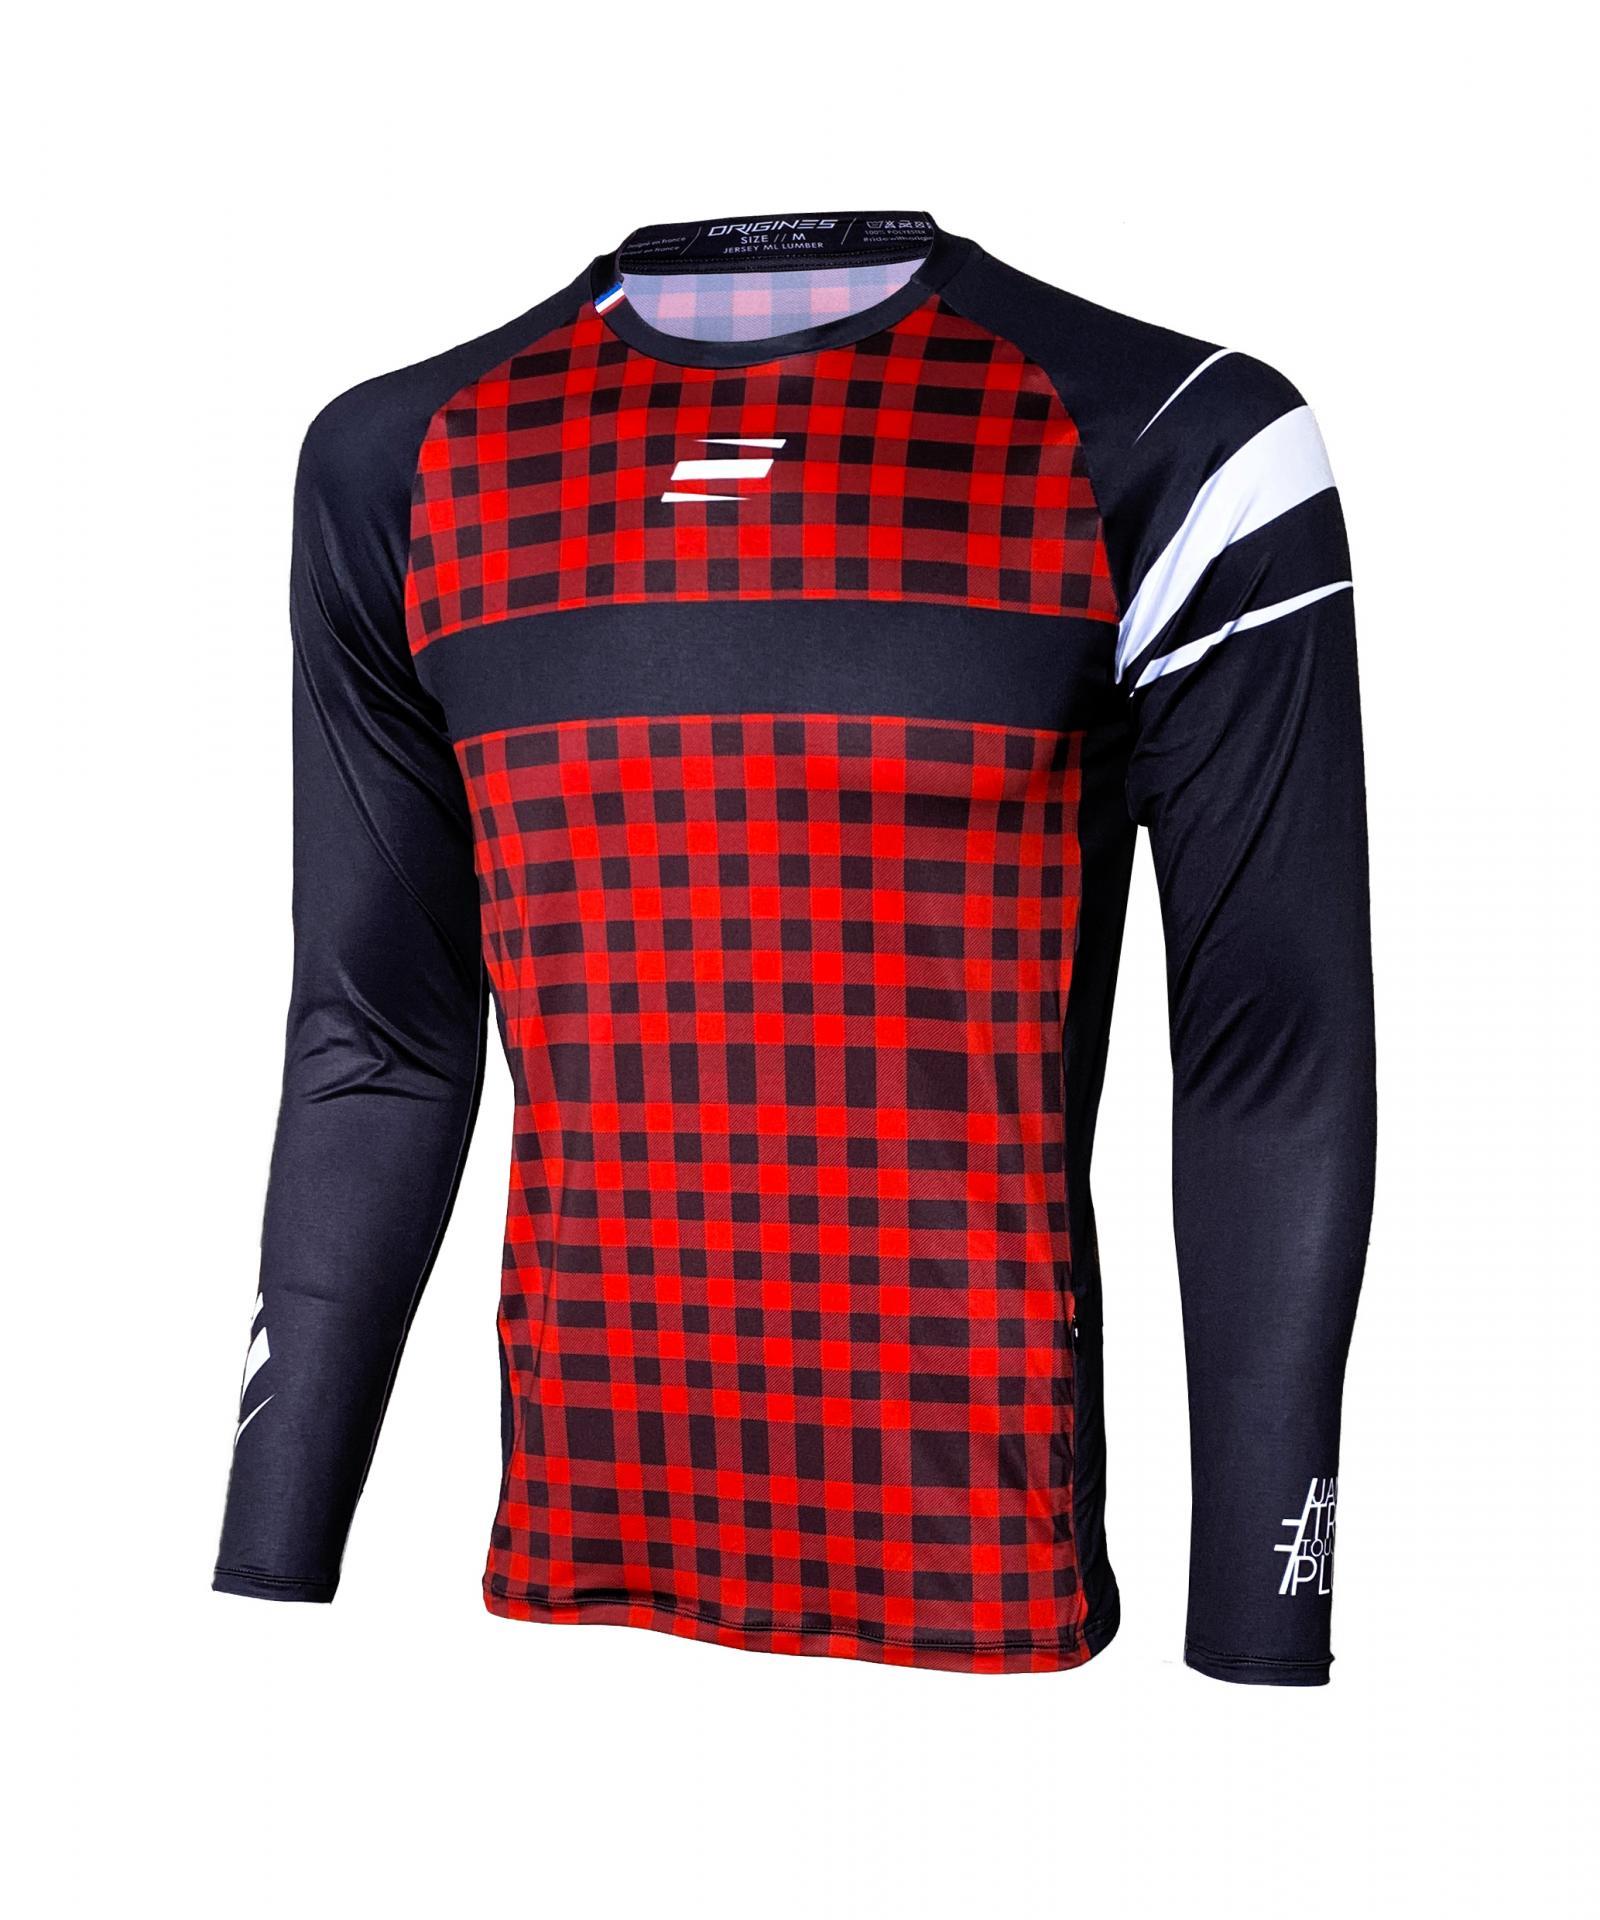 Jersey origines clothing enduro lumber front 1